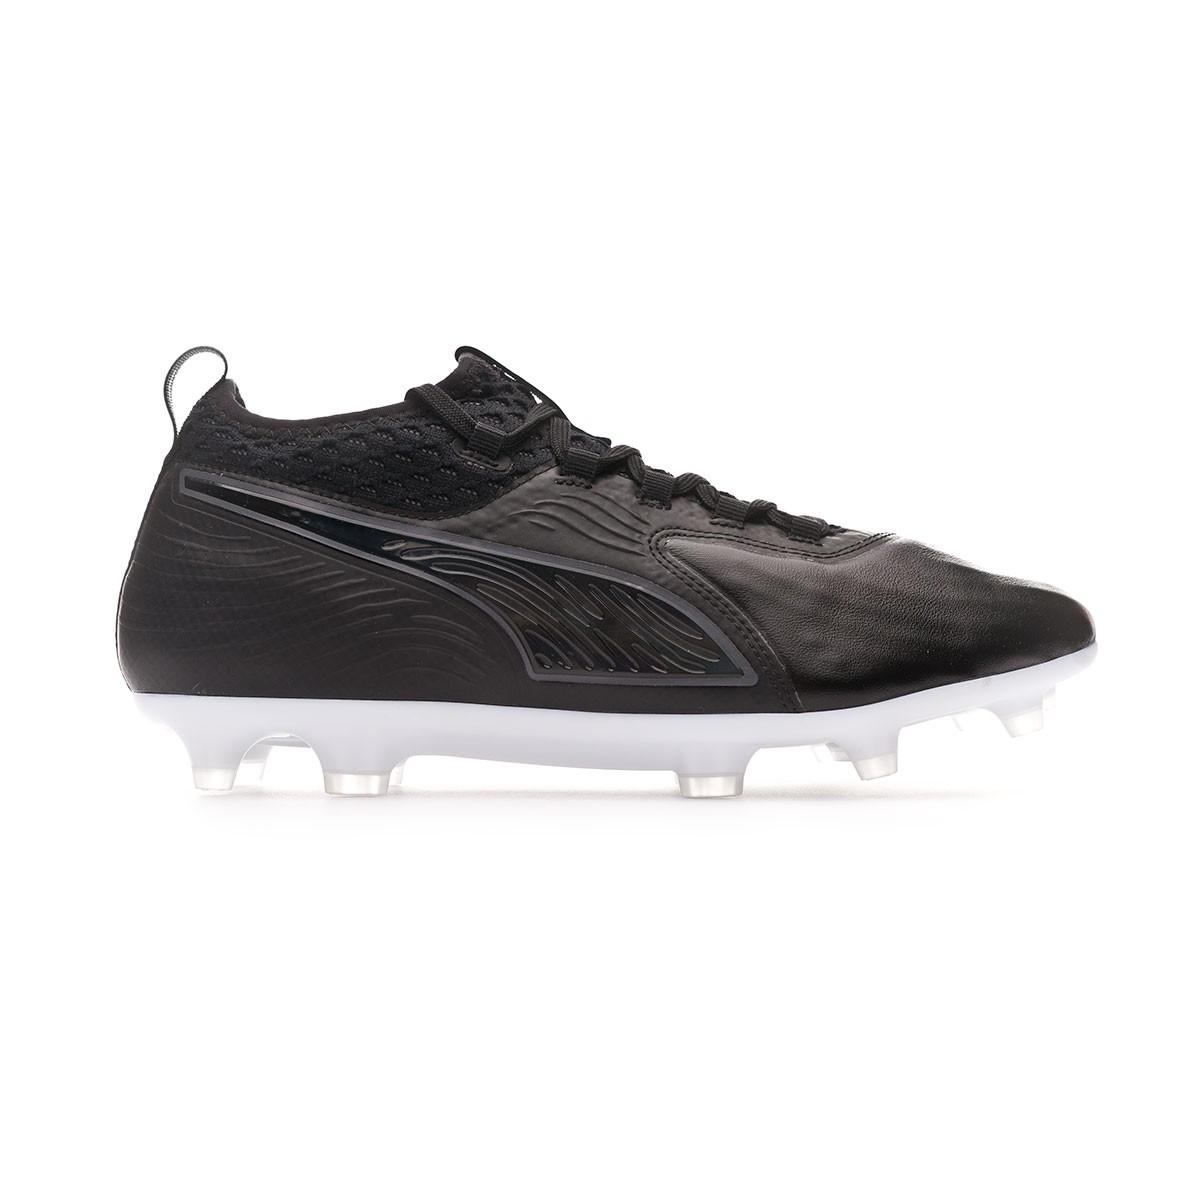 0fc3e65e2c9 Football Boots Puma One 19.2 FG AG Black-White - Football store Fútbol  Emotion